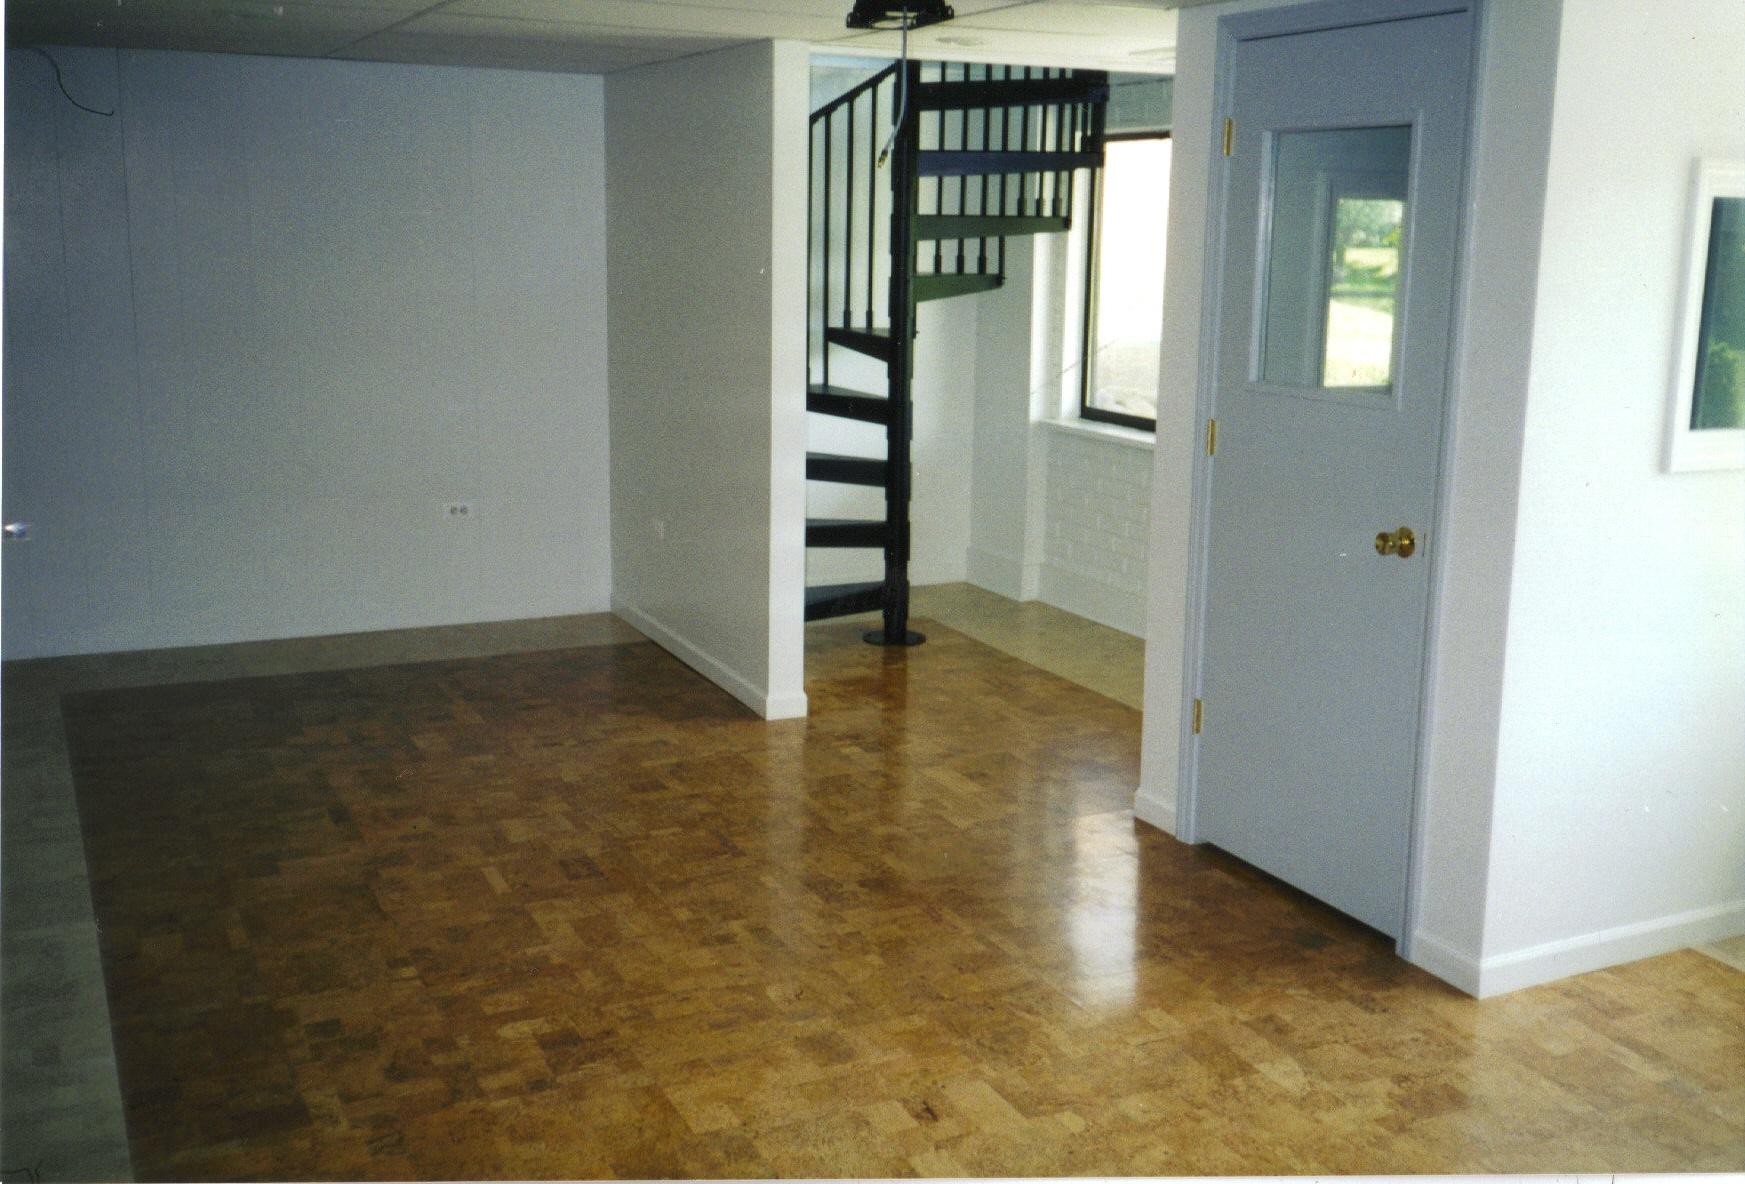 Basement Floor Paint Options (View 5 of 10)